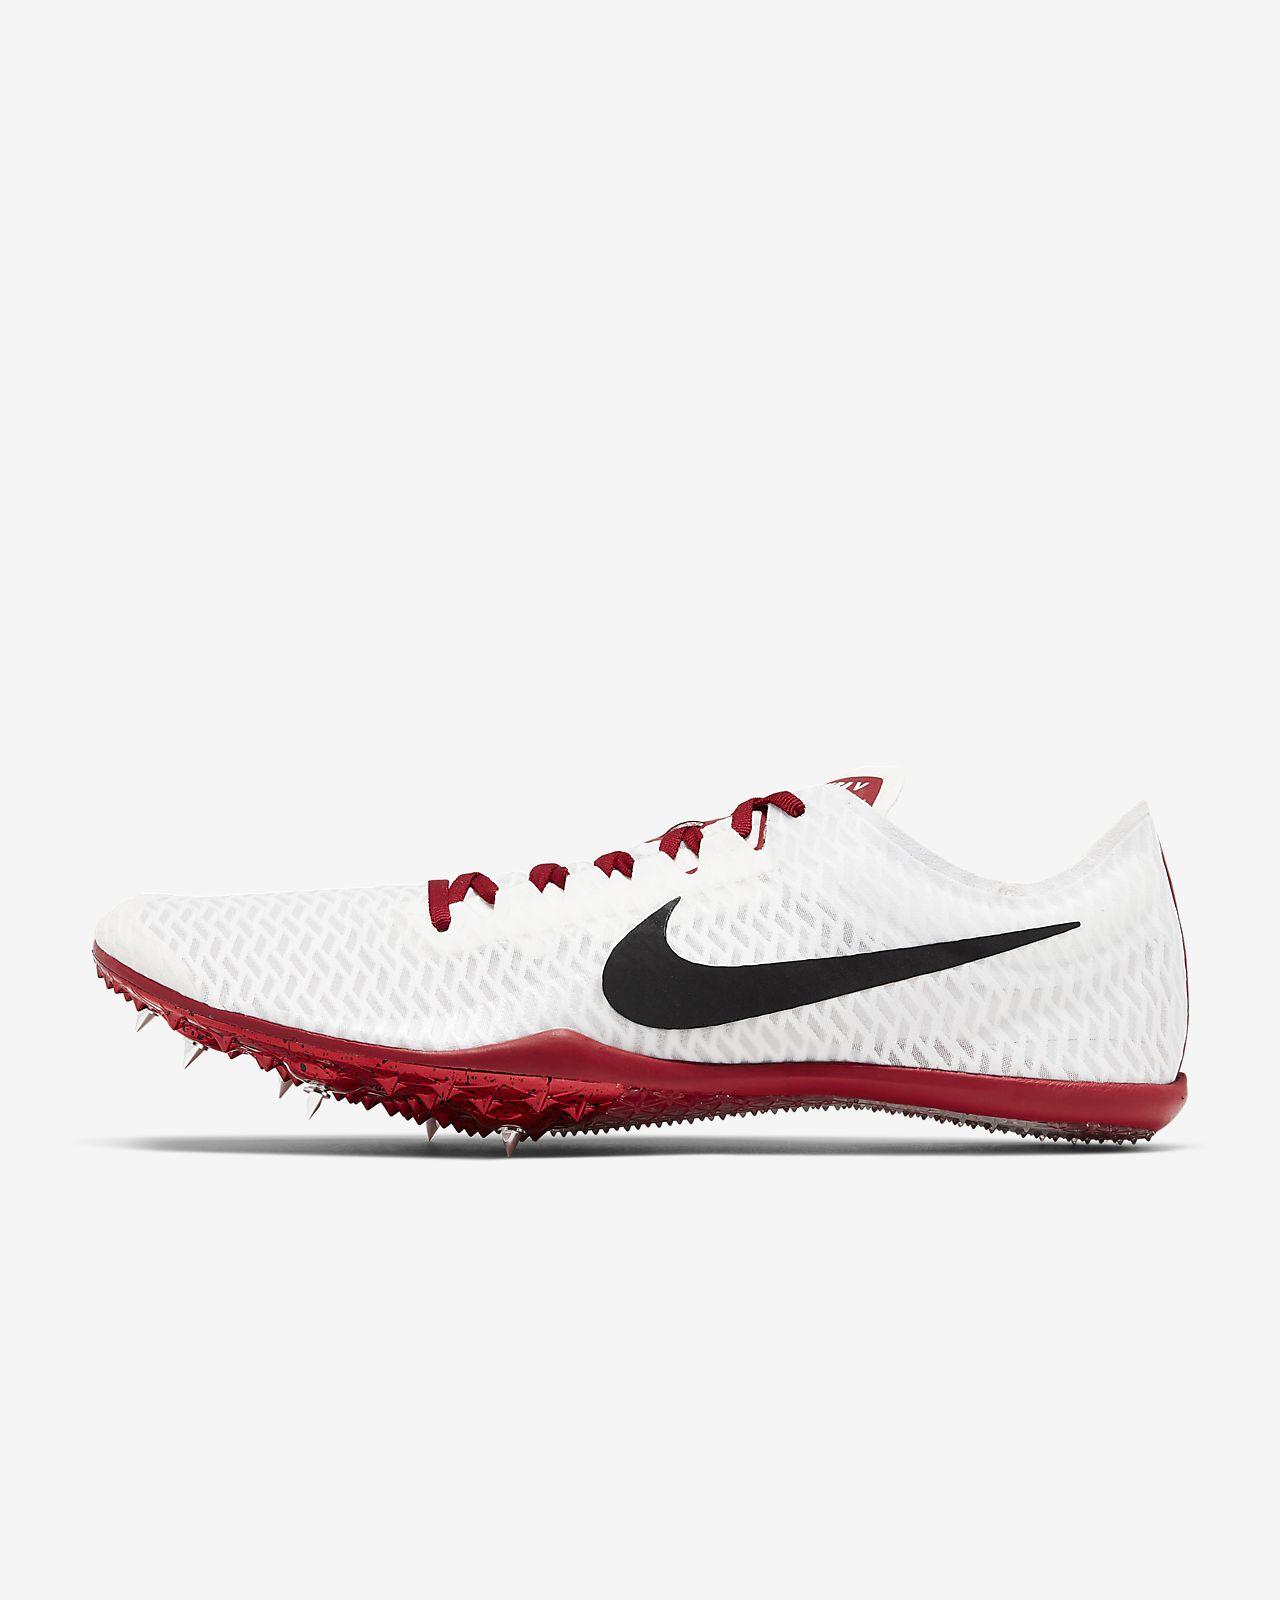 Nike Zoom Mamba 5 Bowerman Track Club Sabatilles de running